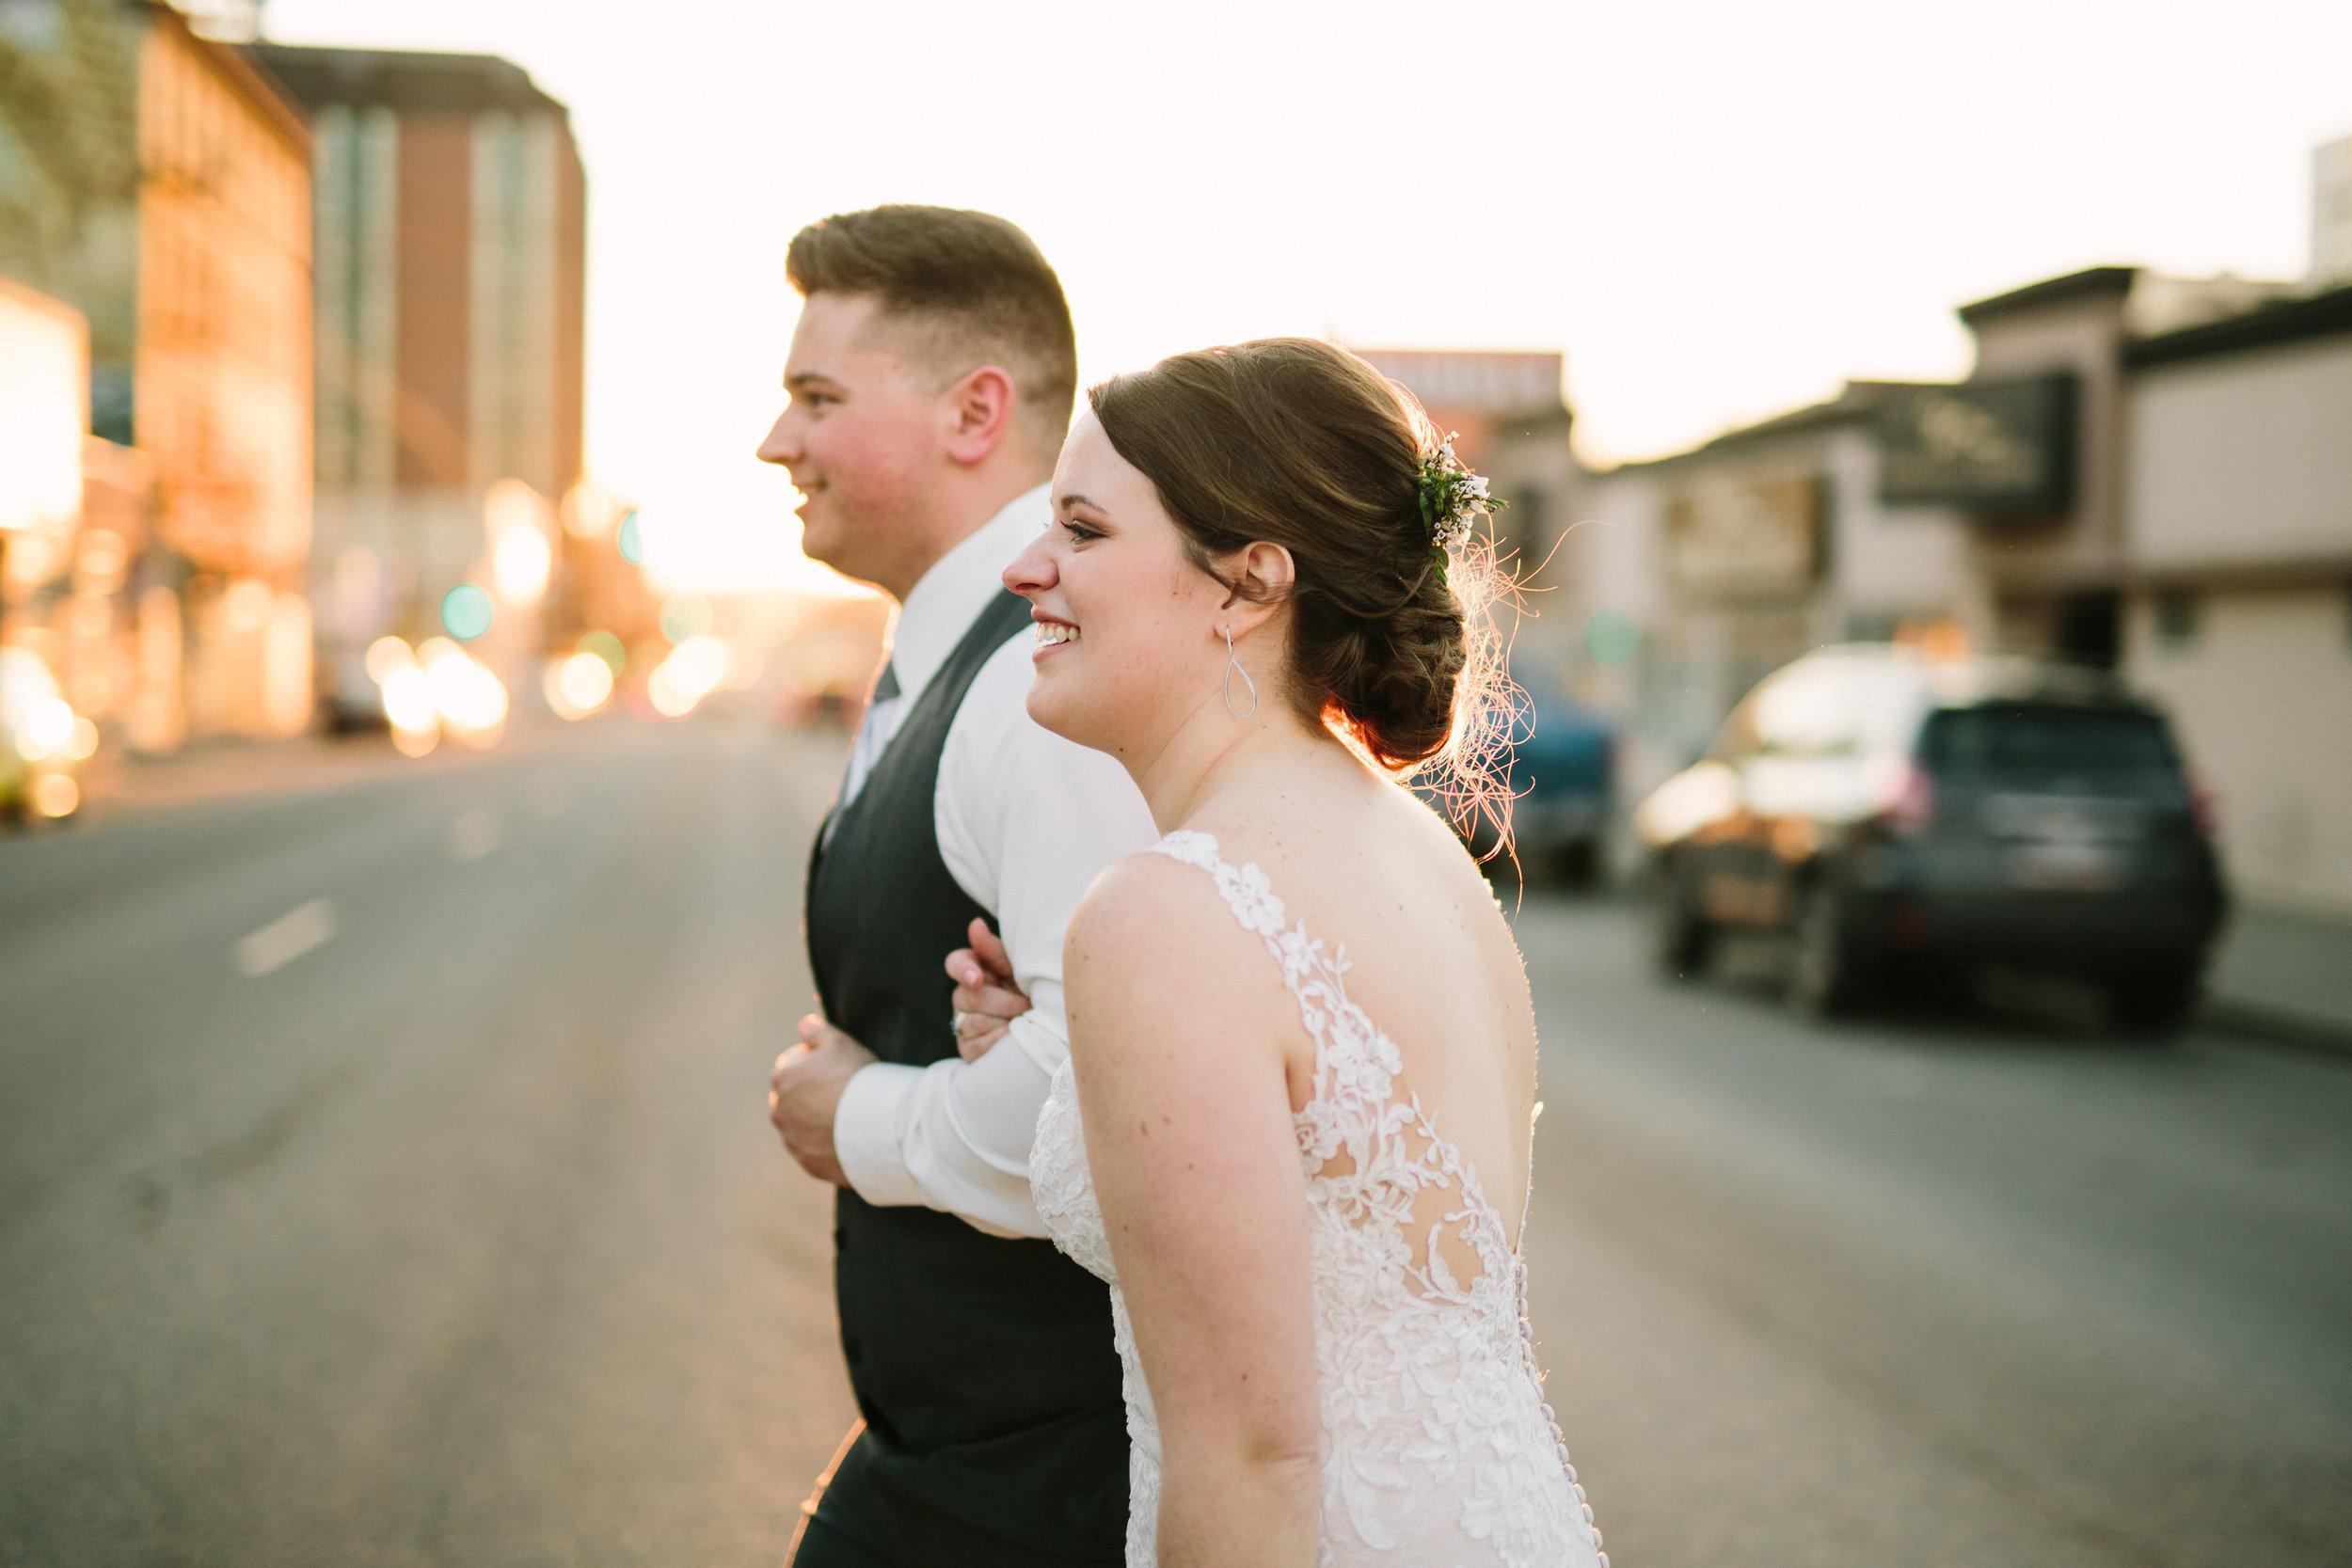 Fun Rustic spokane wedding groom bride walking outside holding hands sunset street